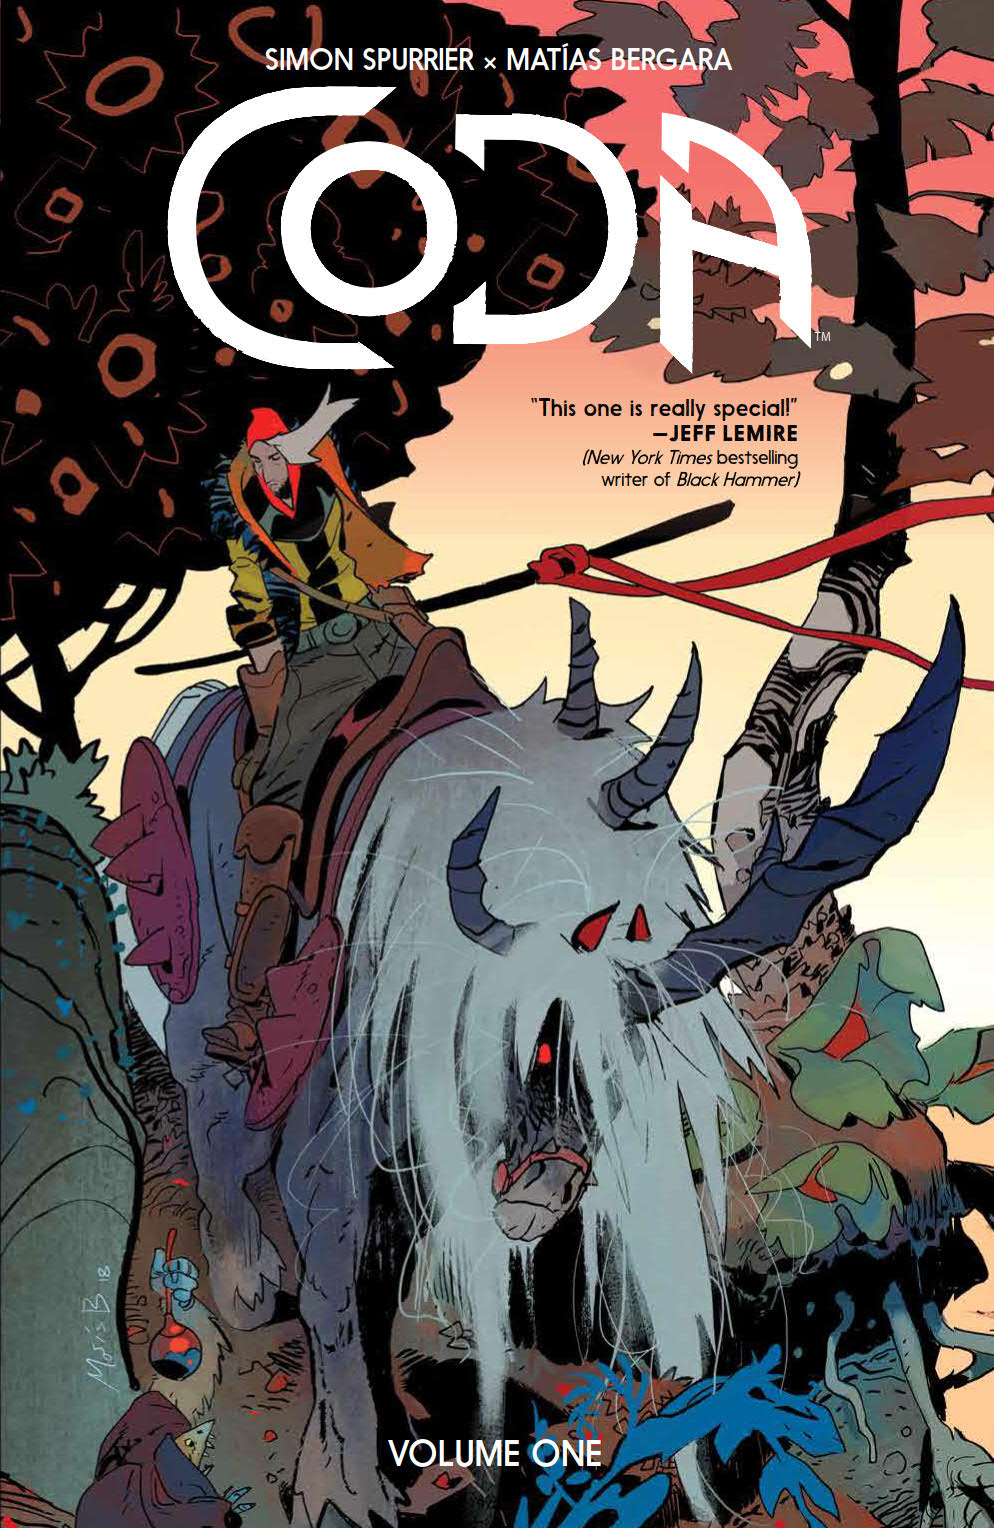 Coda Vol. 1 review: Beautiful and bewildering